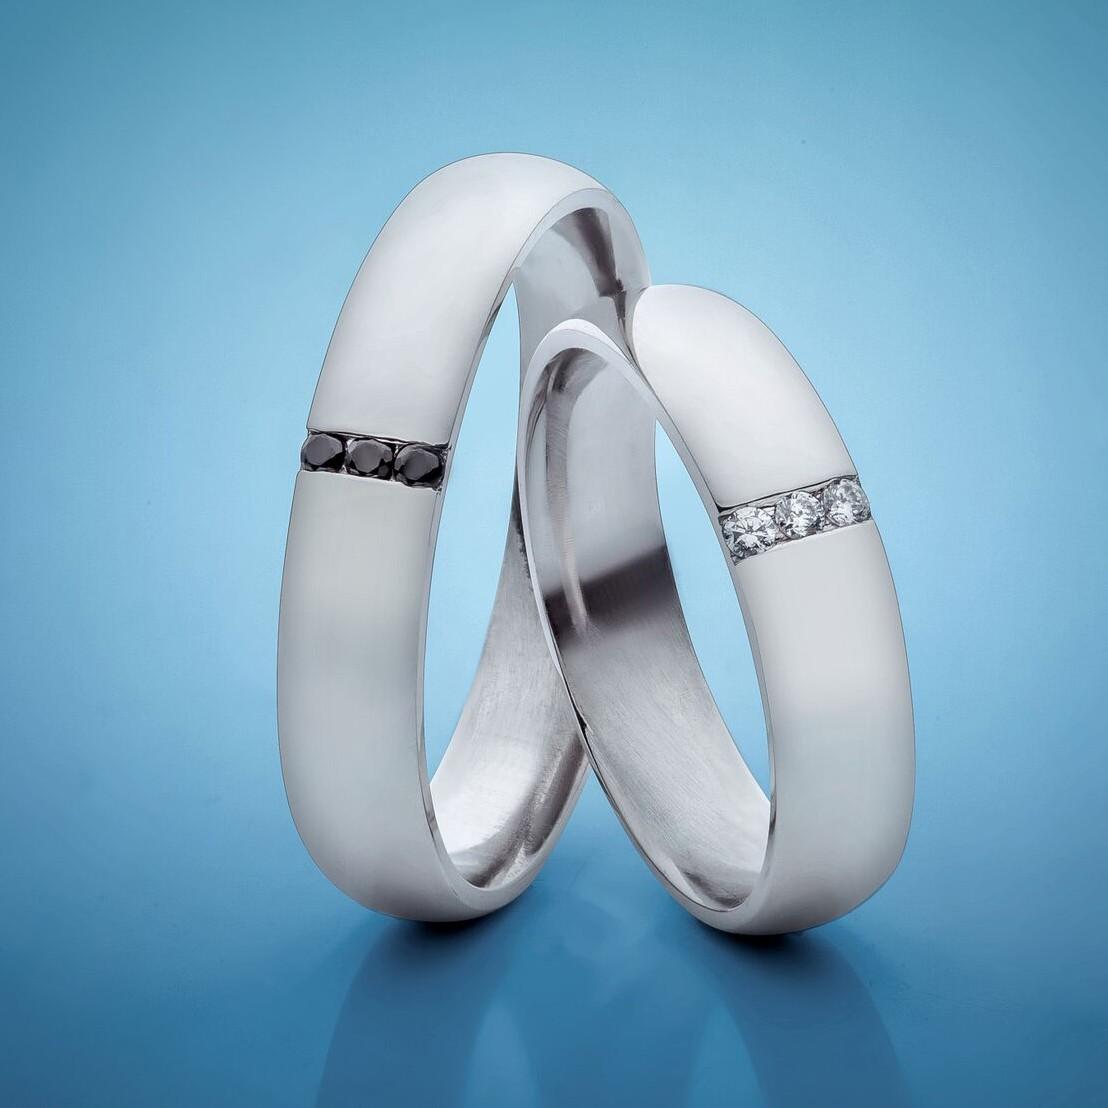 Snubni Prsteny Z Platiny S Diamanty Vzor C Sn18 Esterstyl Cz